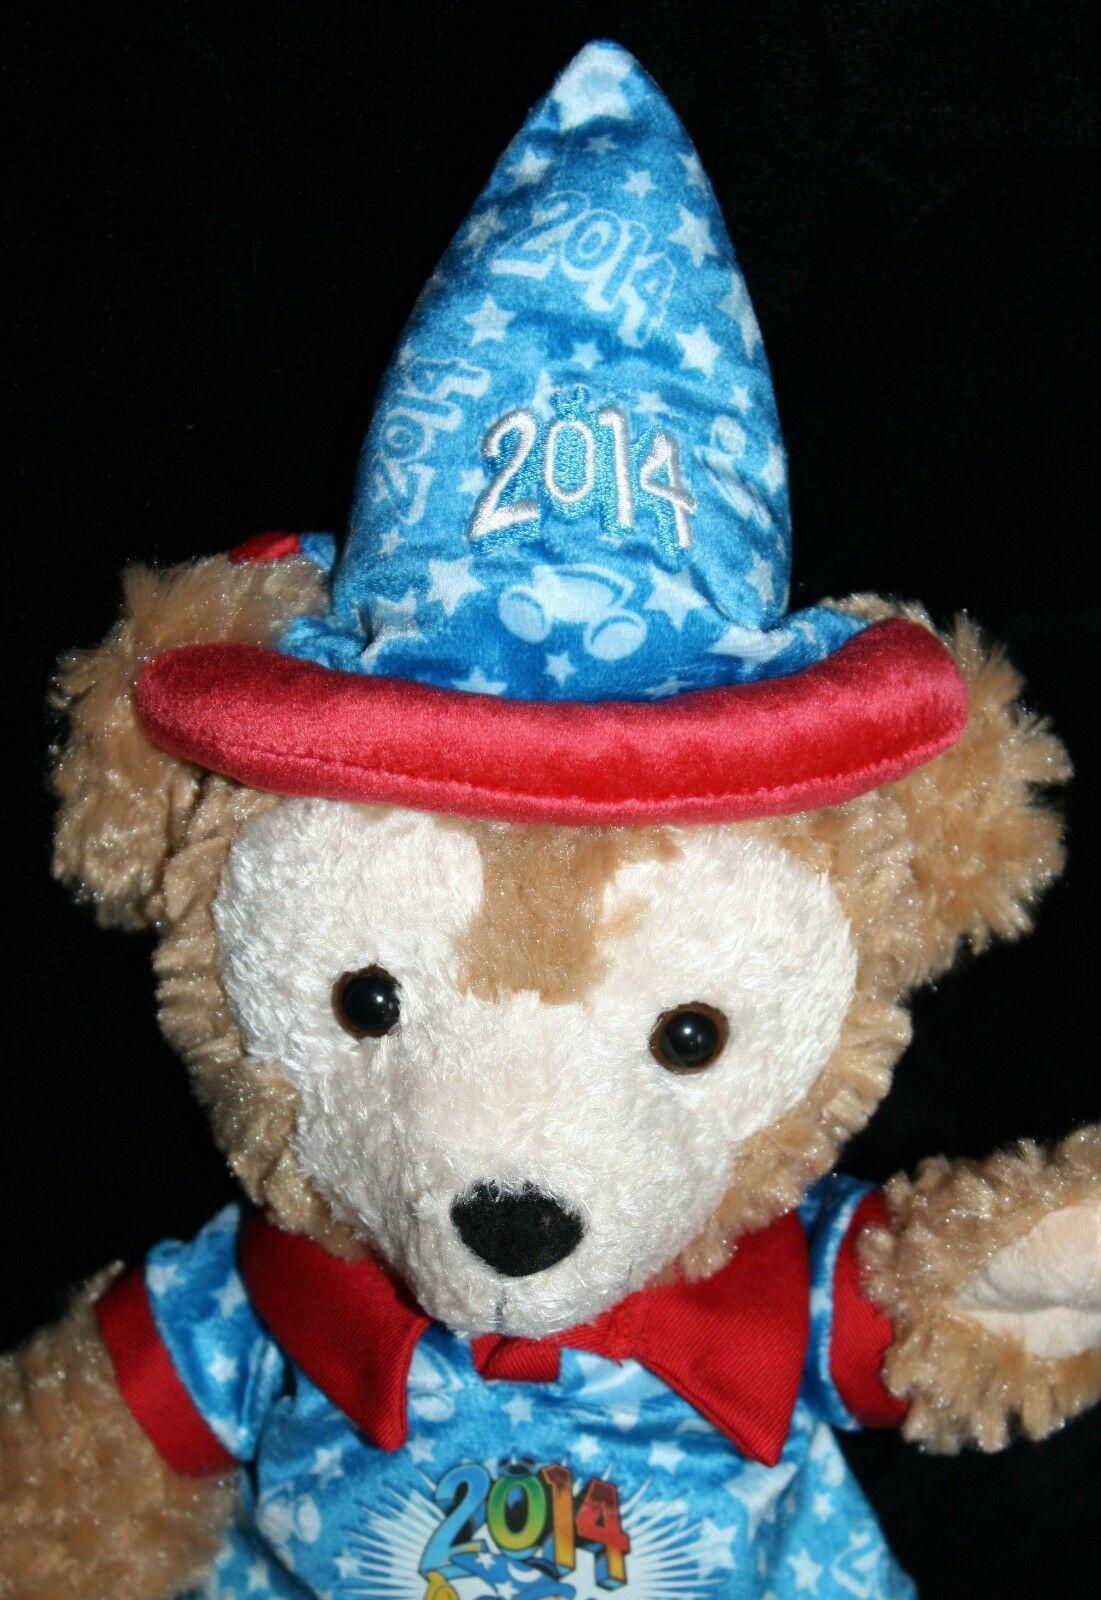 "DUFFY BEAR 18"" Hidden Mickey Disney Sorcerer Wizard Plush Blue Hat Soft Toy 2014"